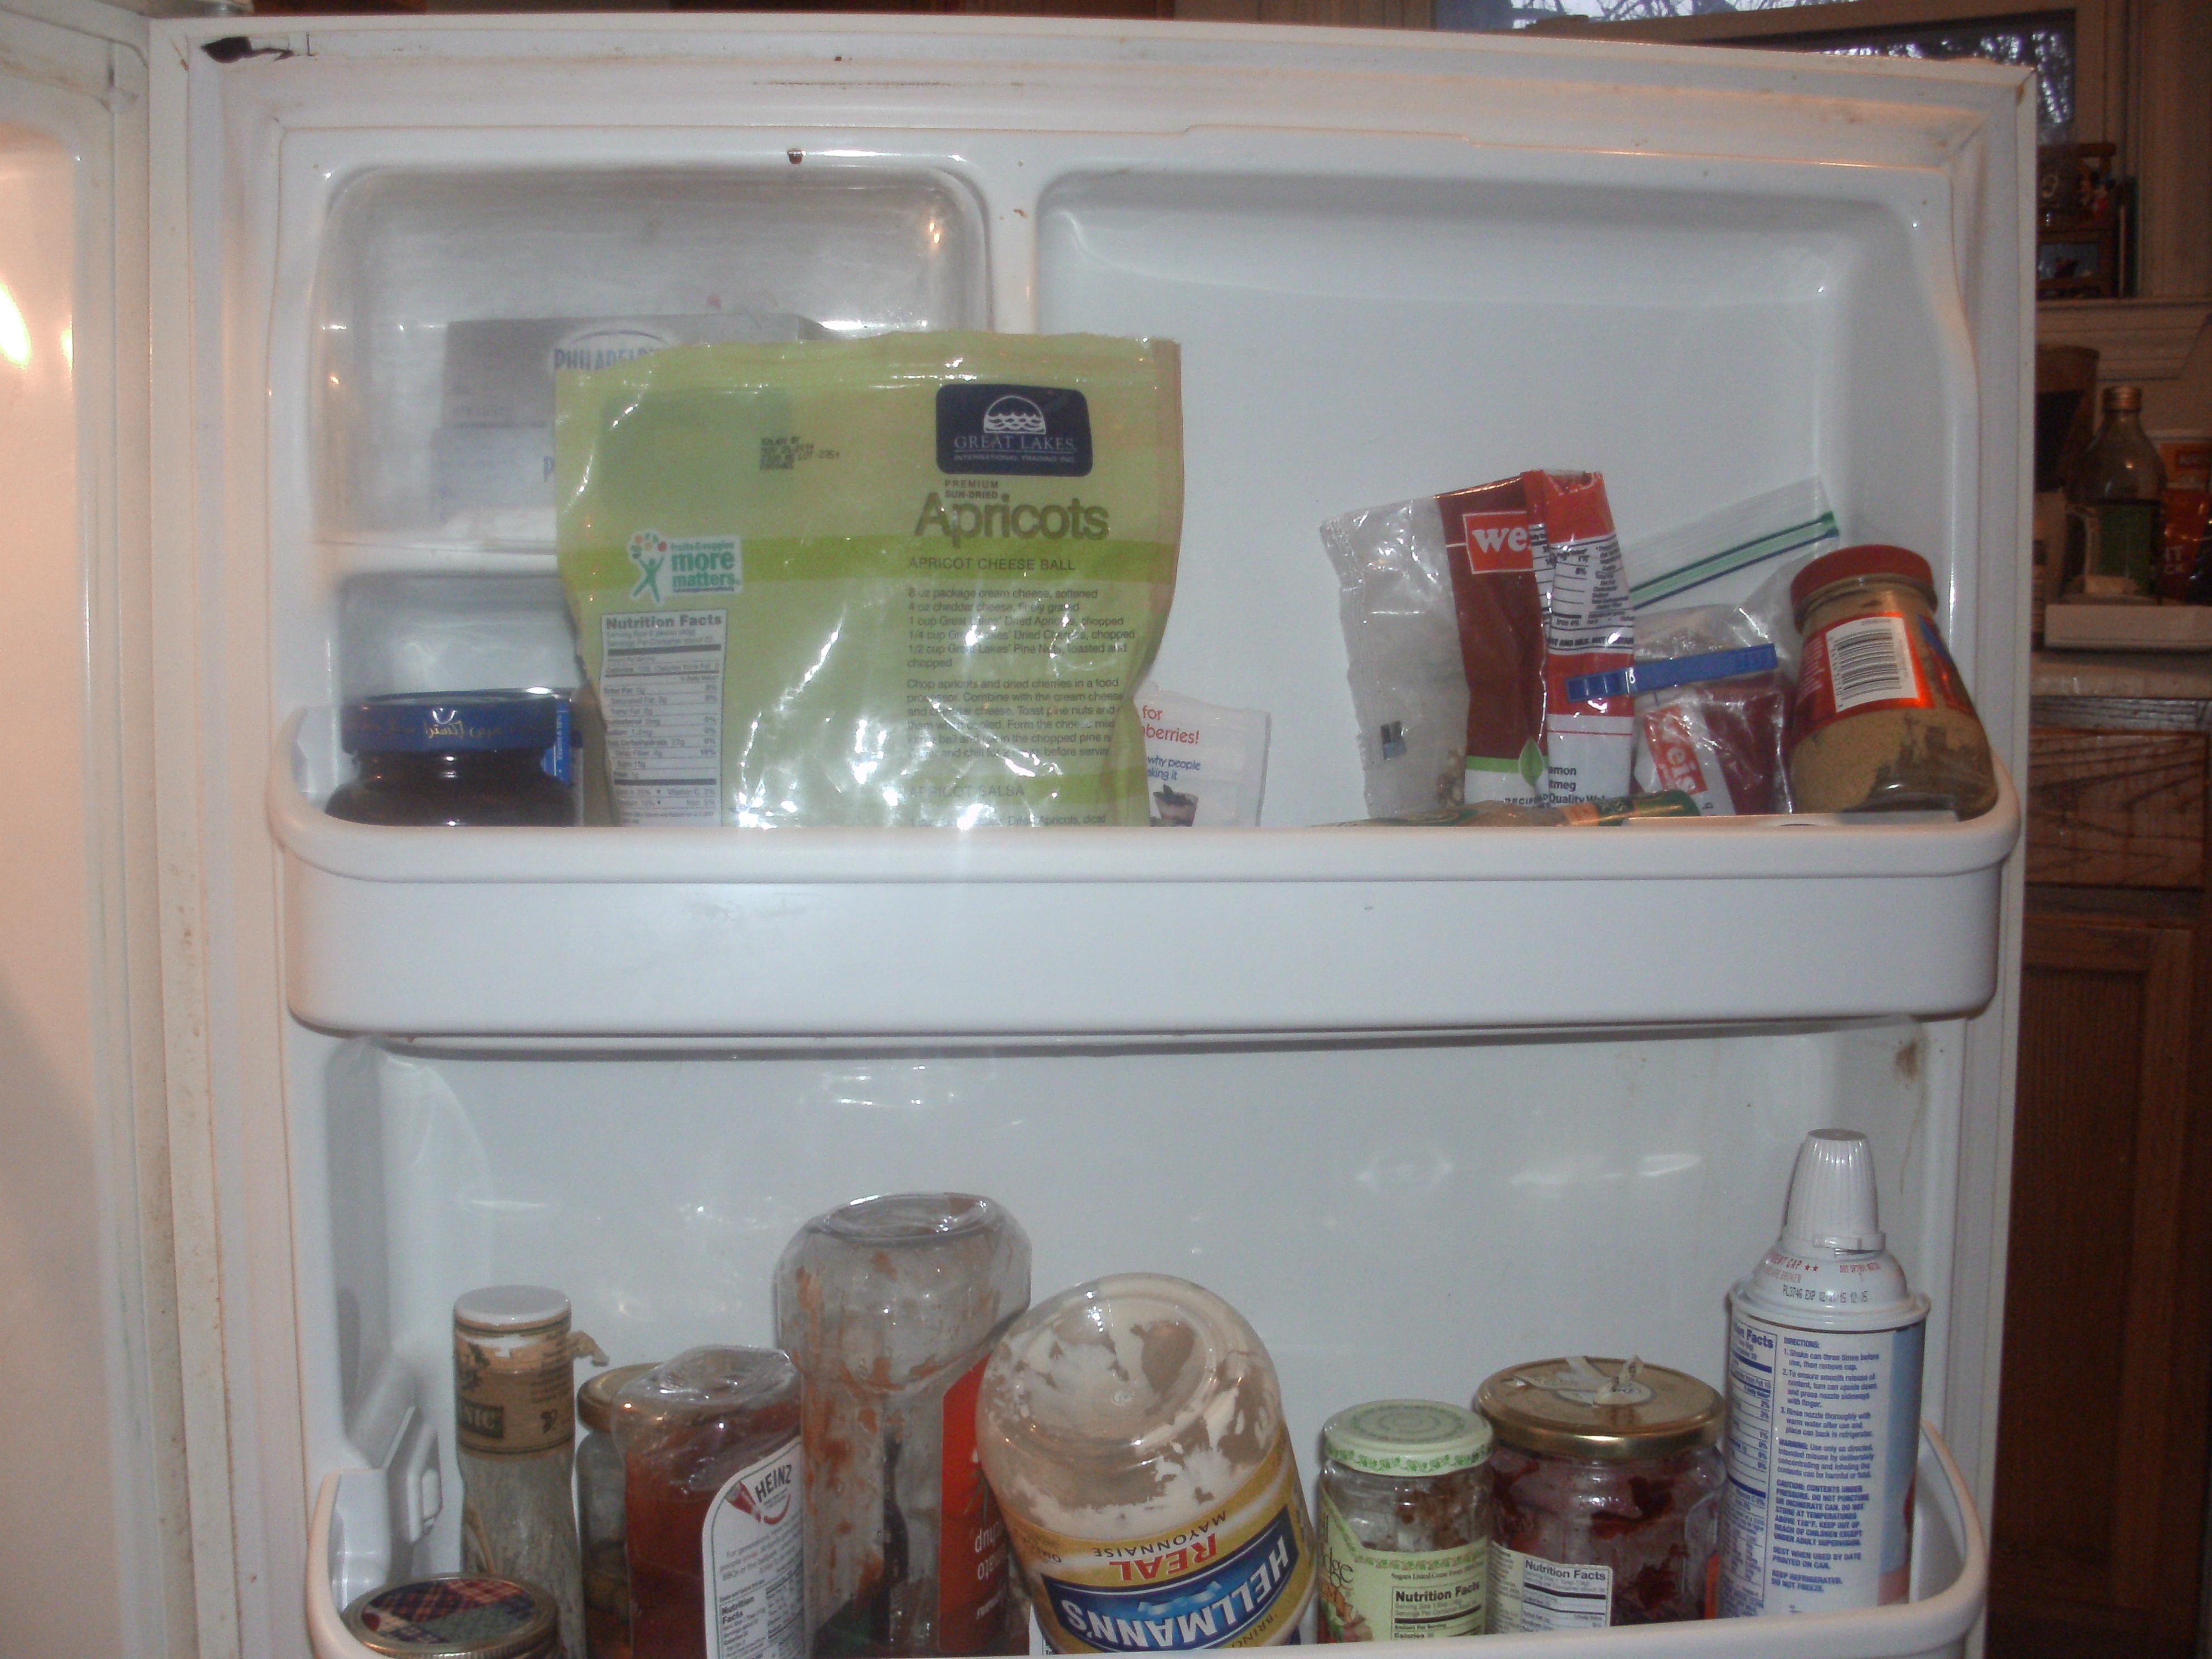 False alarm, the fridge is back on, but I\'m suspicious now | Retmeishka